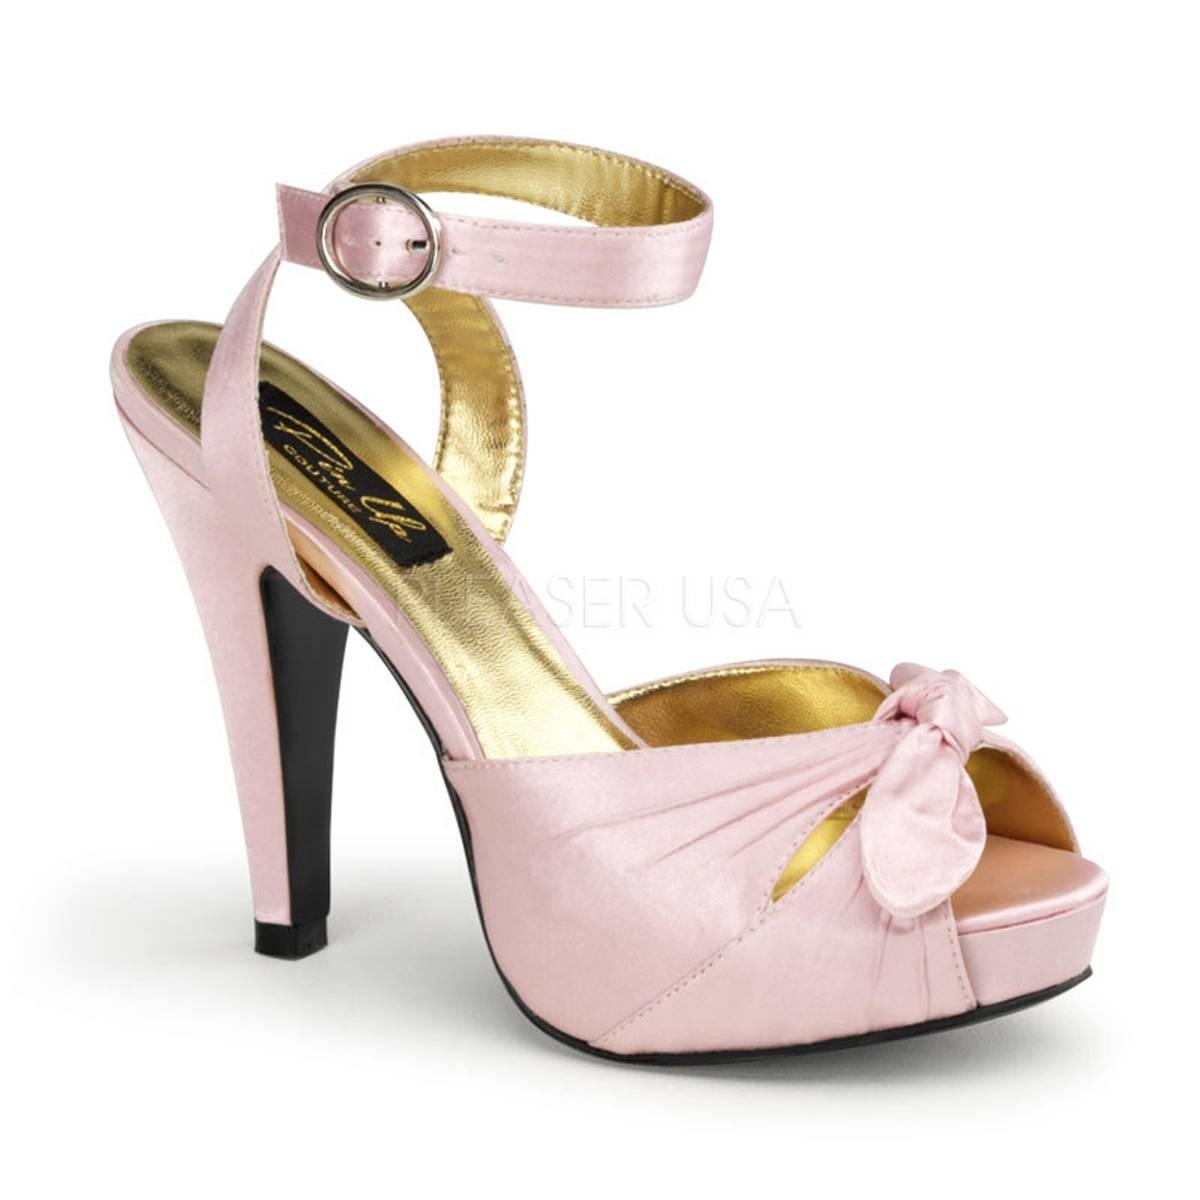 Sandalen - BETTIE 04 ° Damen Sandalette ° Pink Satin ° Pin Up Couture  - Onlineshop RedSixty